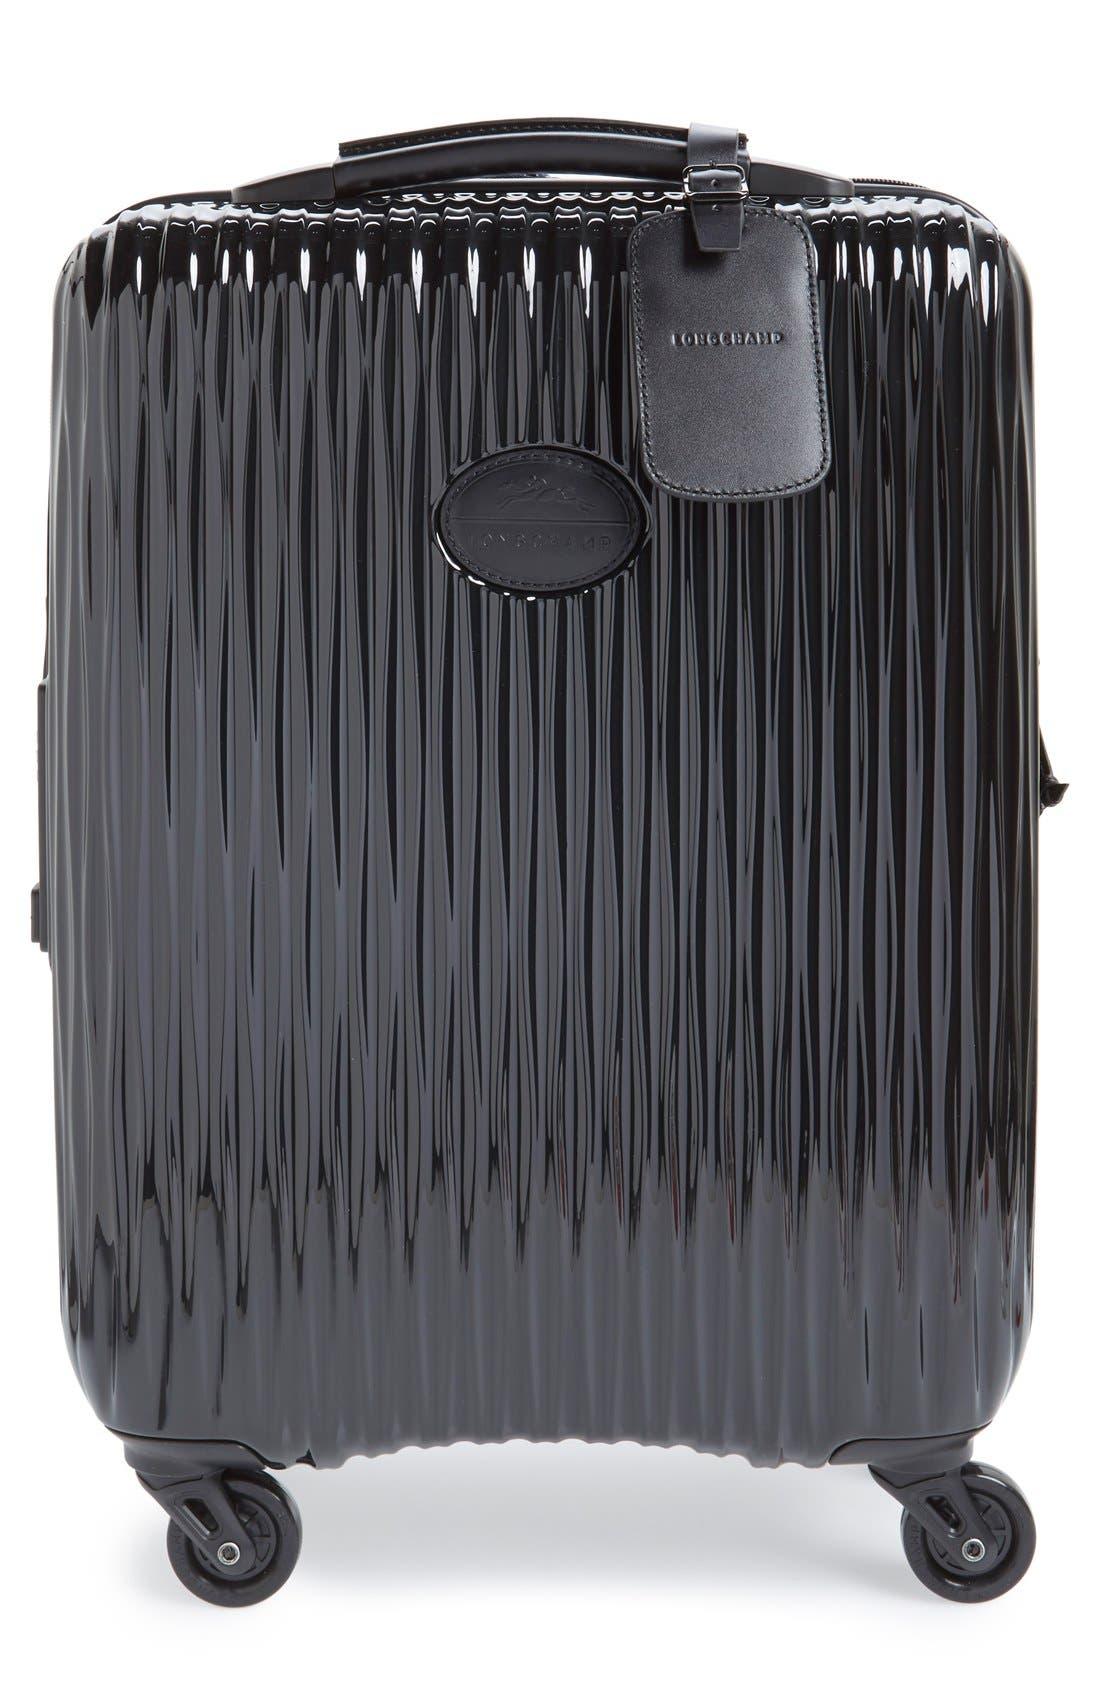 Longchamp 'Fairval' Four-Wheeled Hard Shell Suitcase (22 Inch)